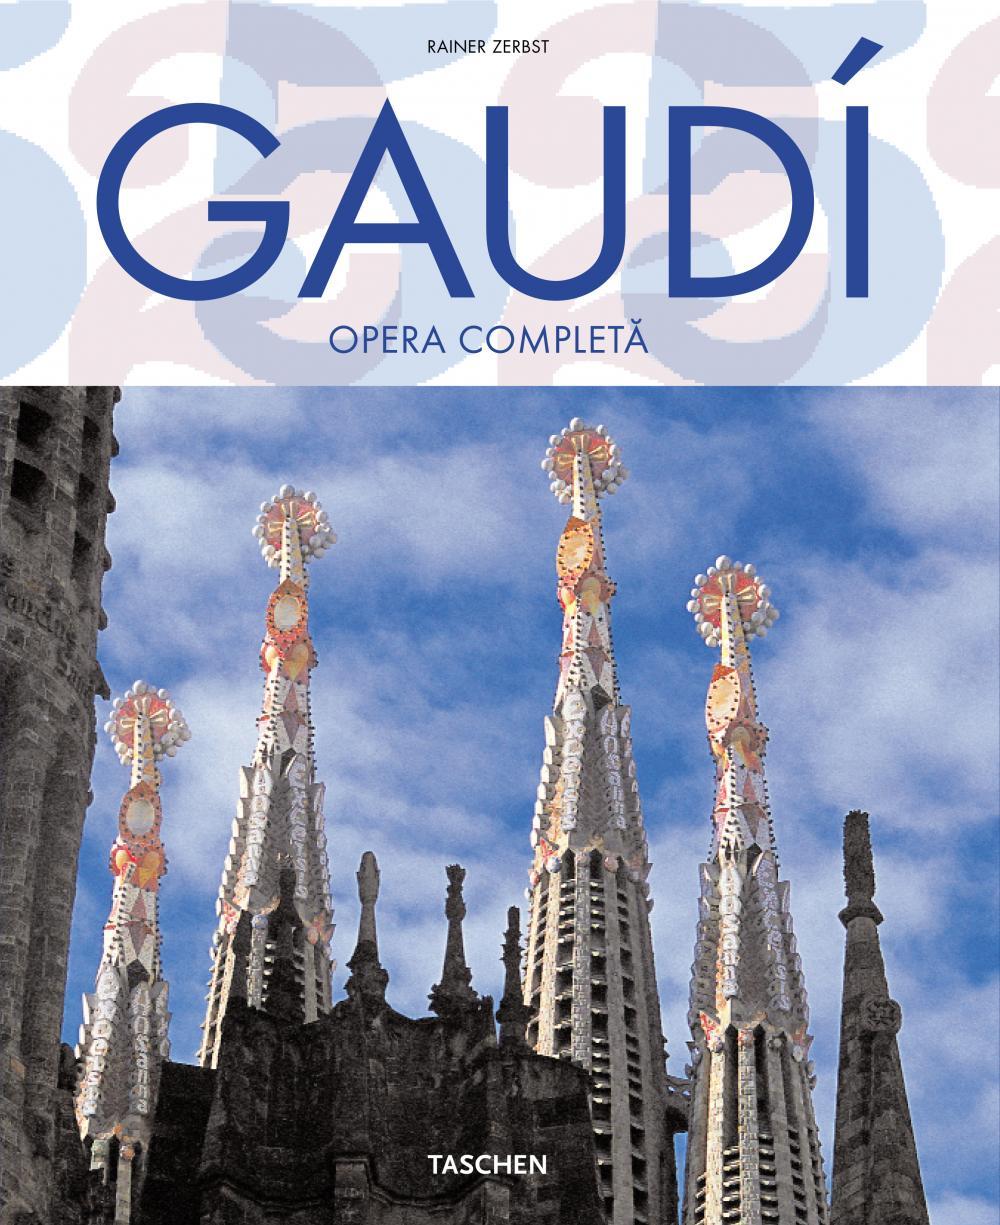 GAUDI - Rainer Zerbst, Taschen 25 Editie Aniversara